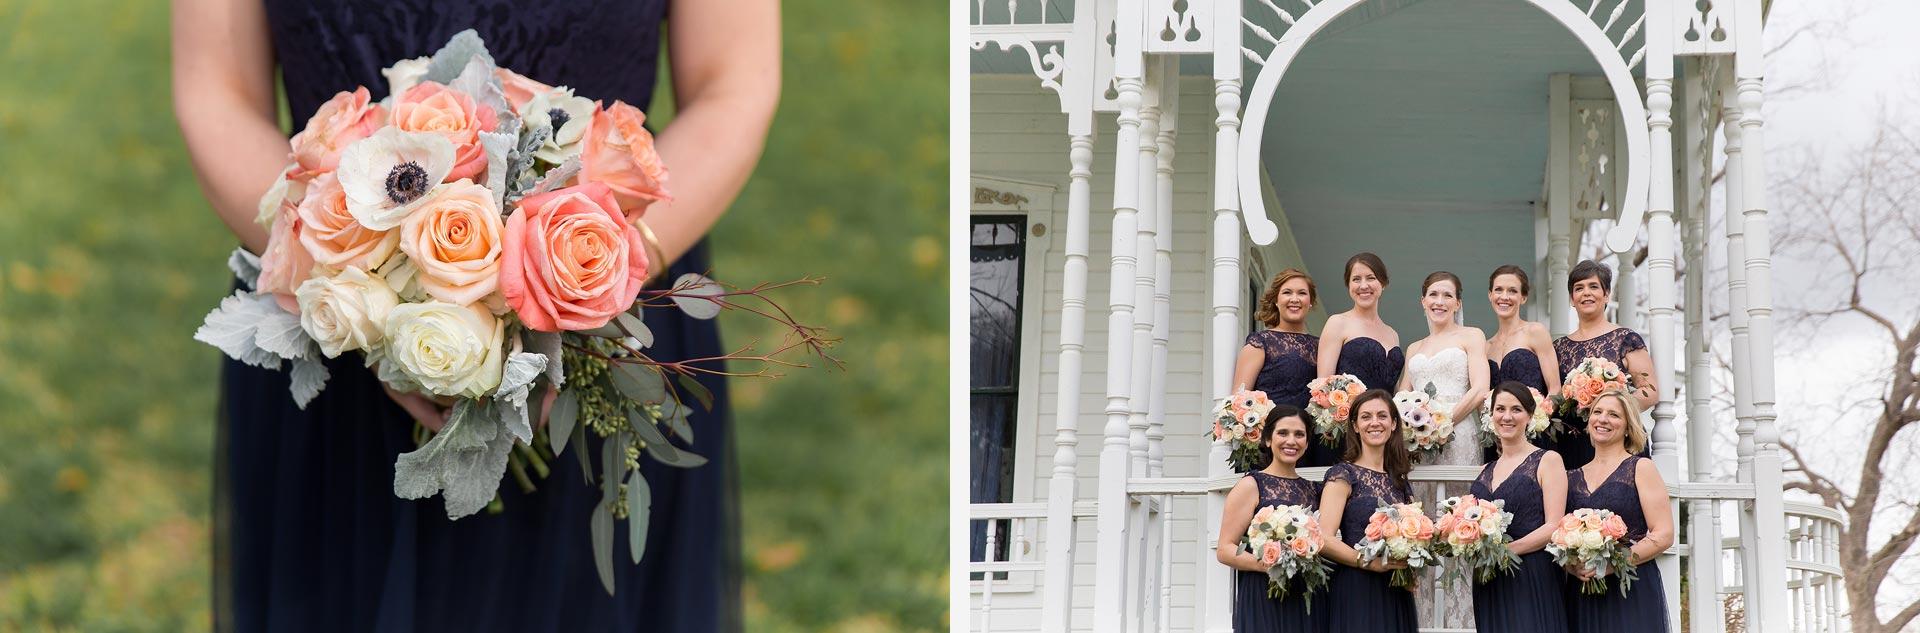 Barr Mansion Wedding Photographers